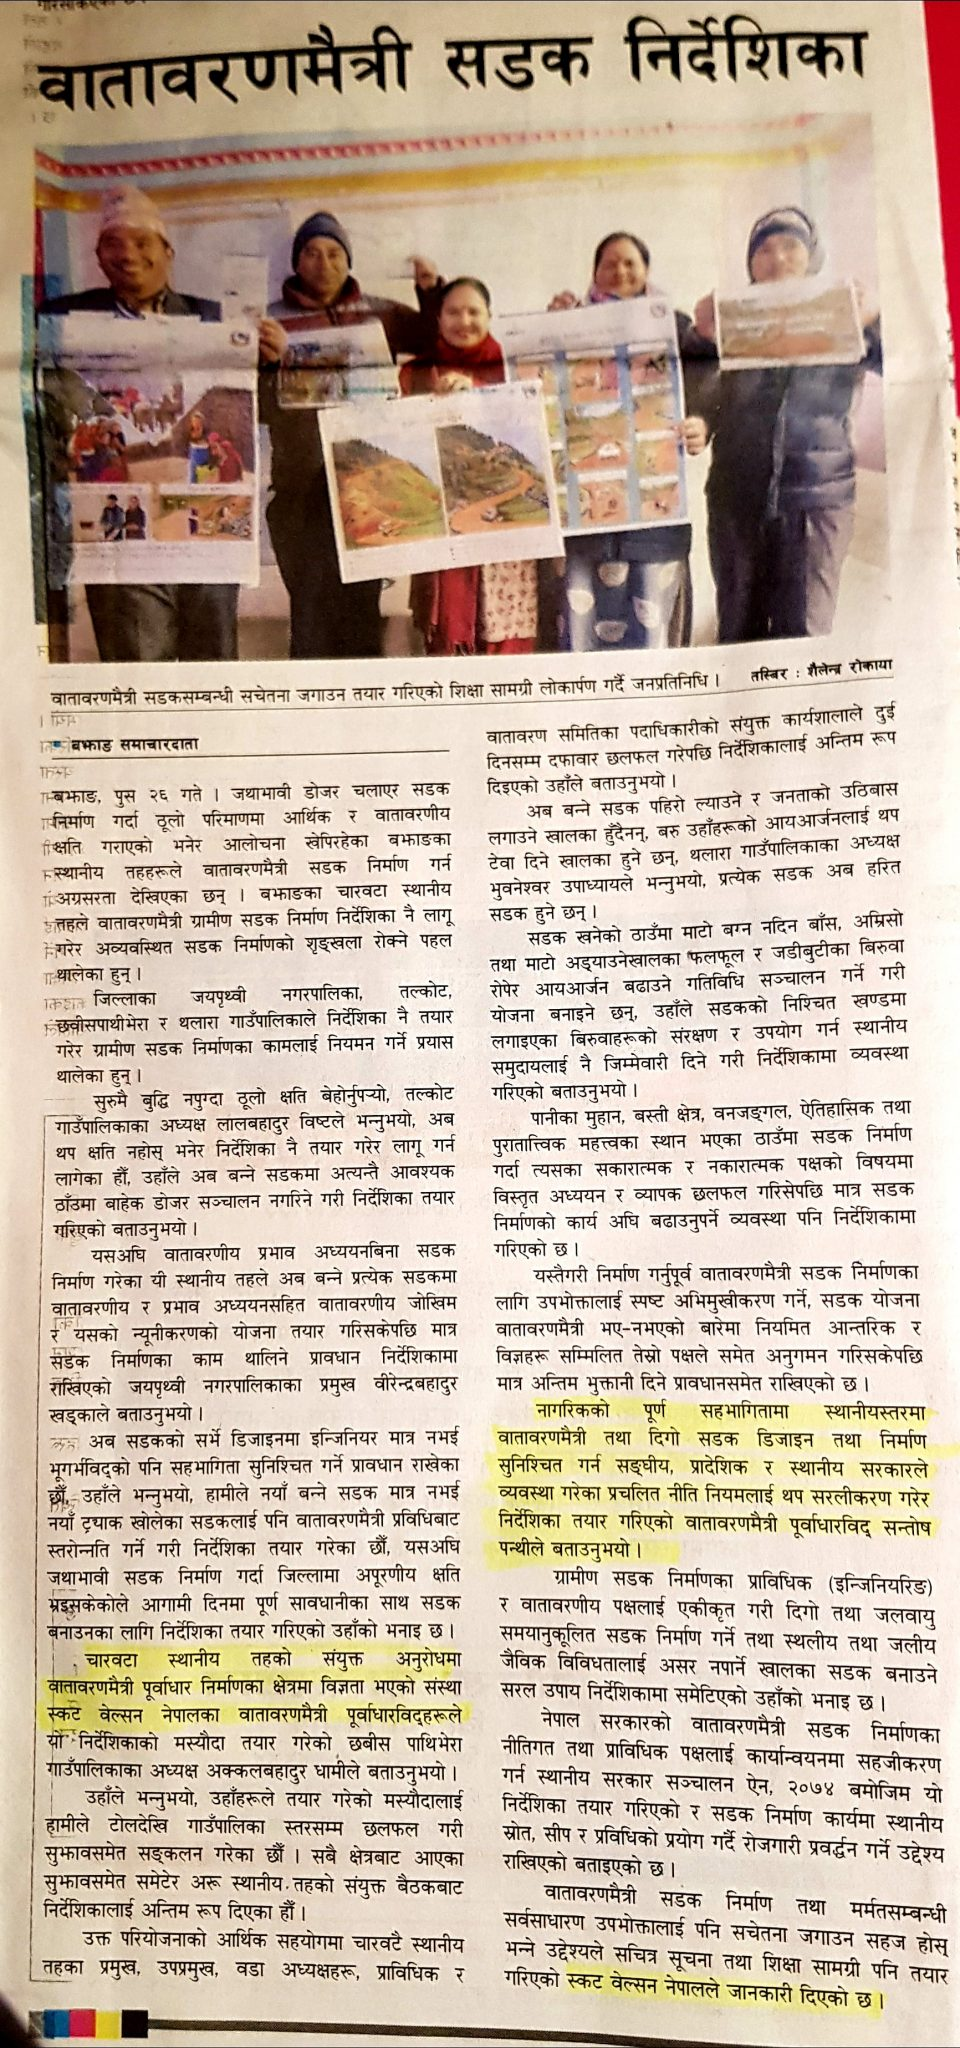 EFRC Bajhang news